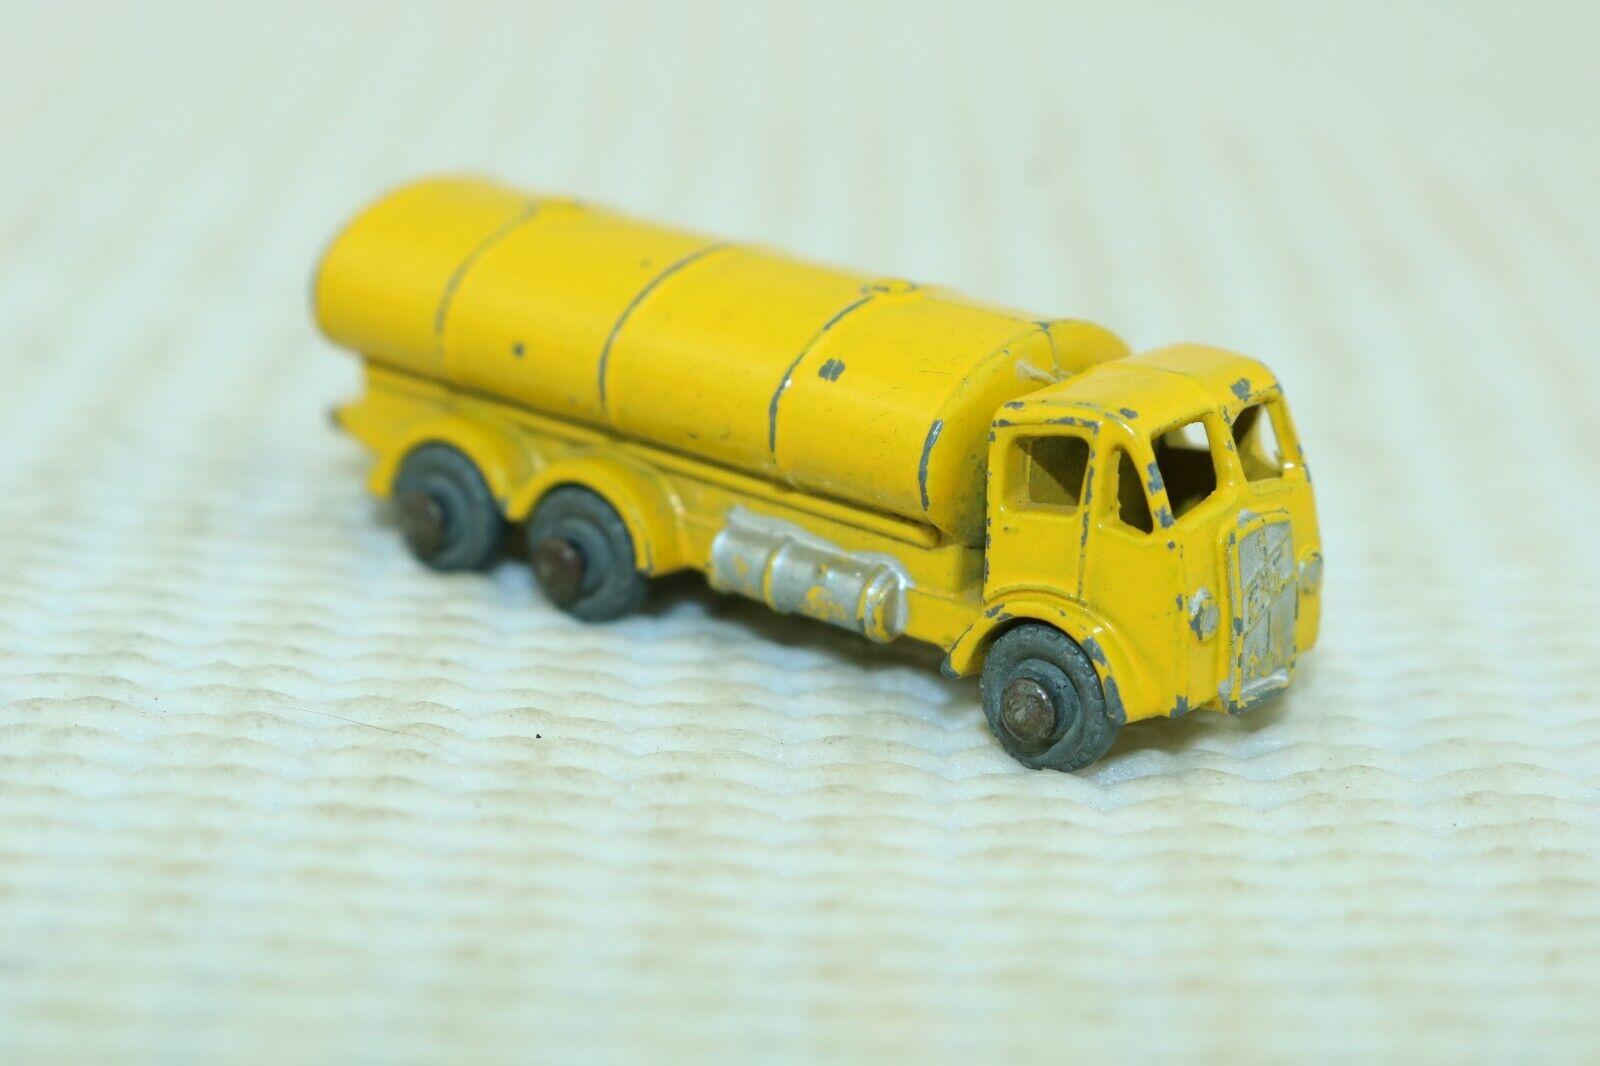 Matchbox Lesney No 11a E.R.F. Petrol Tanker yellow - England